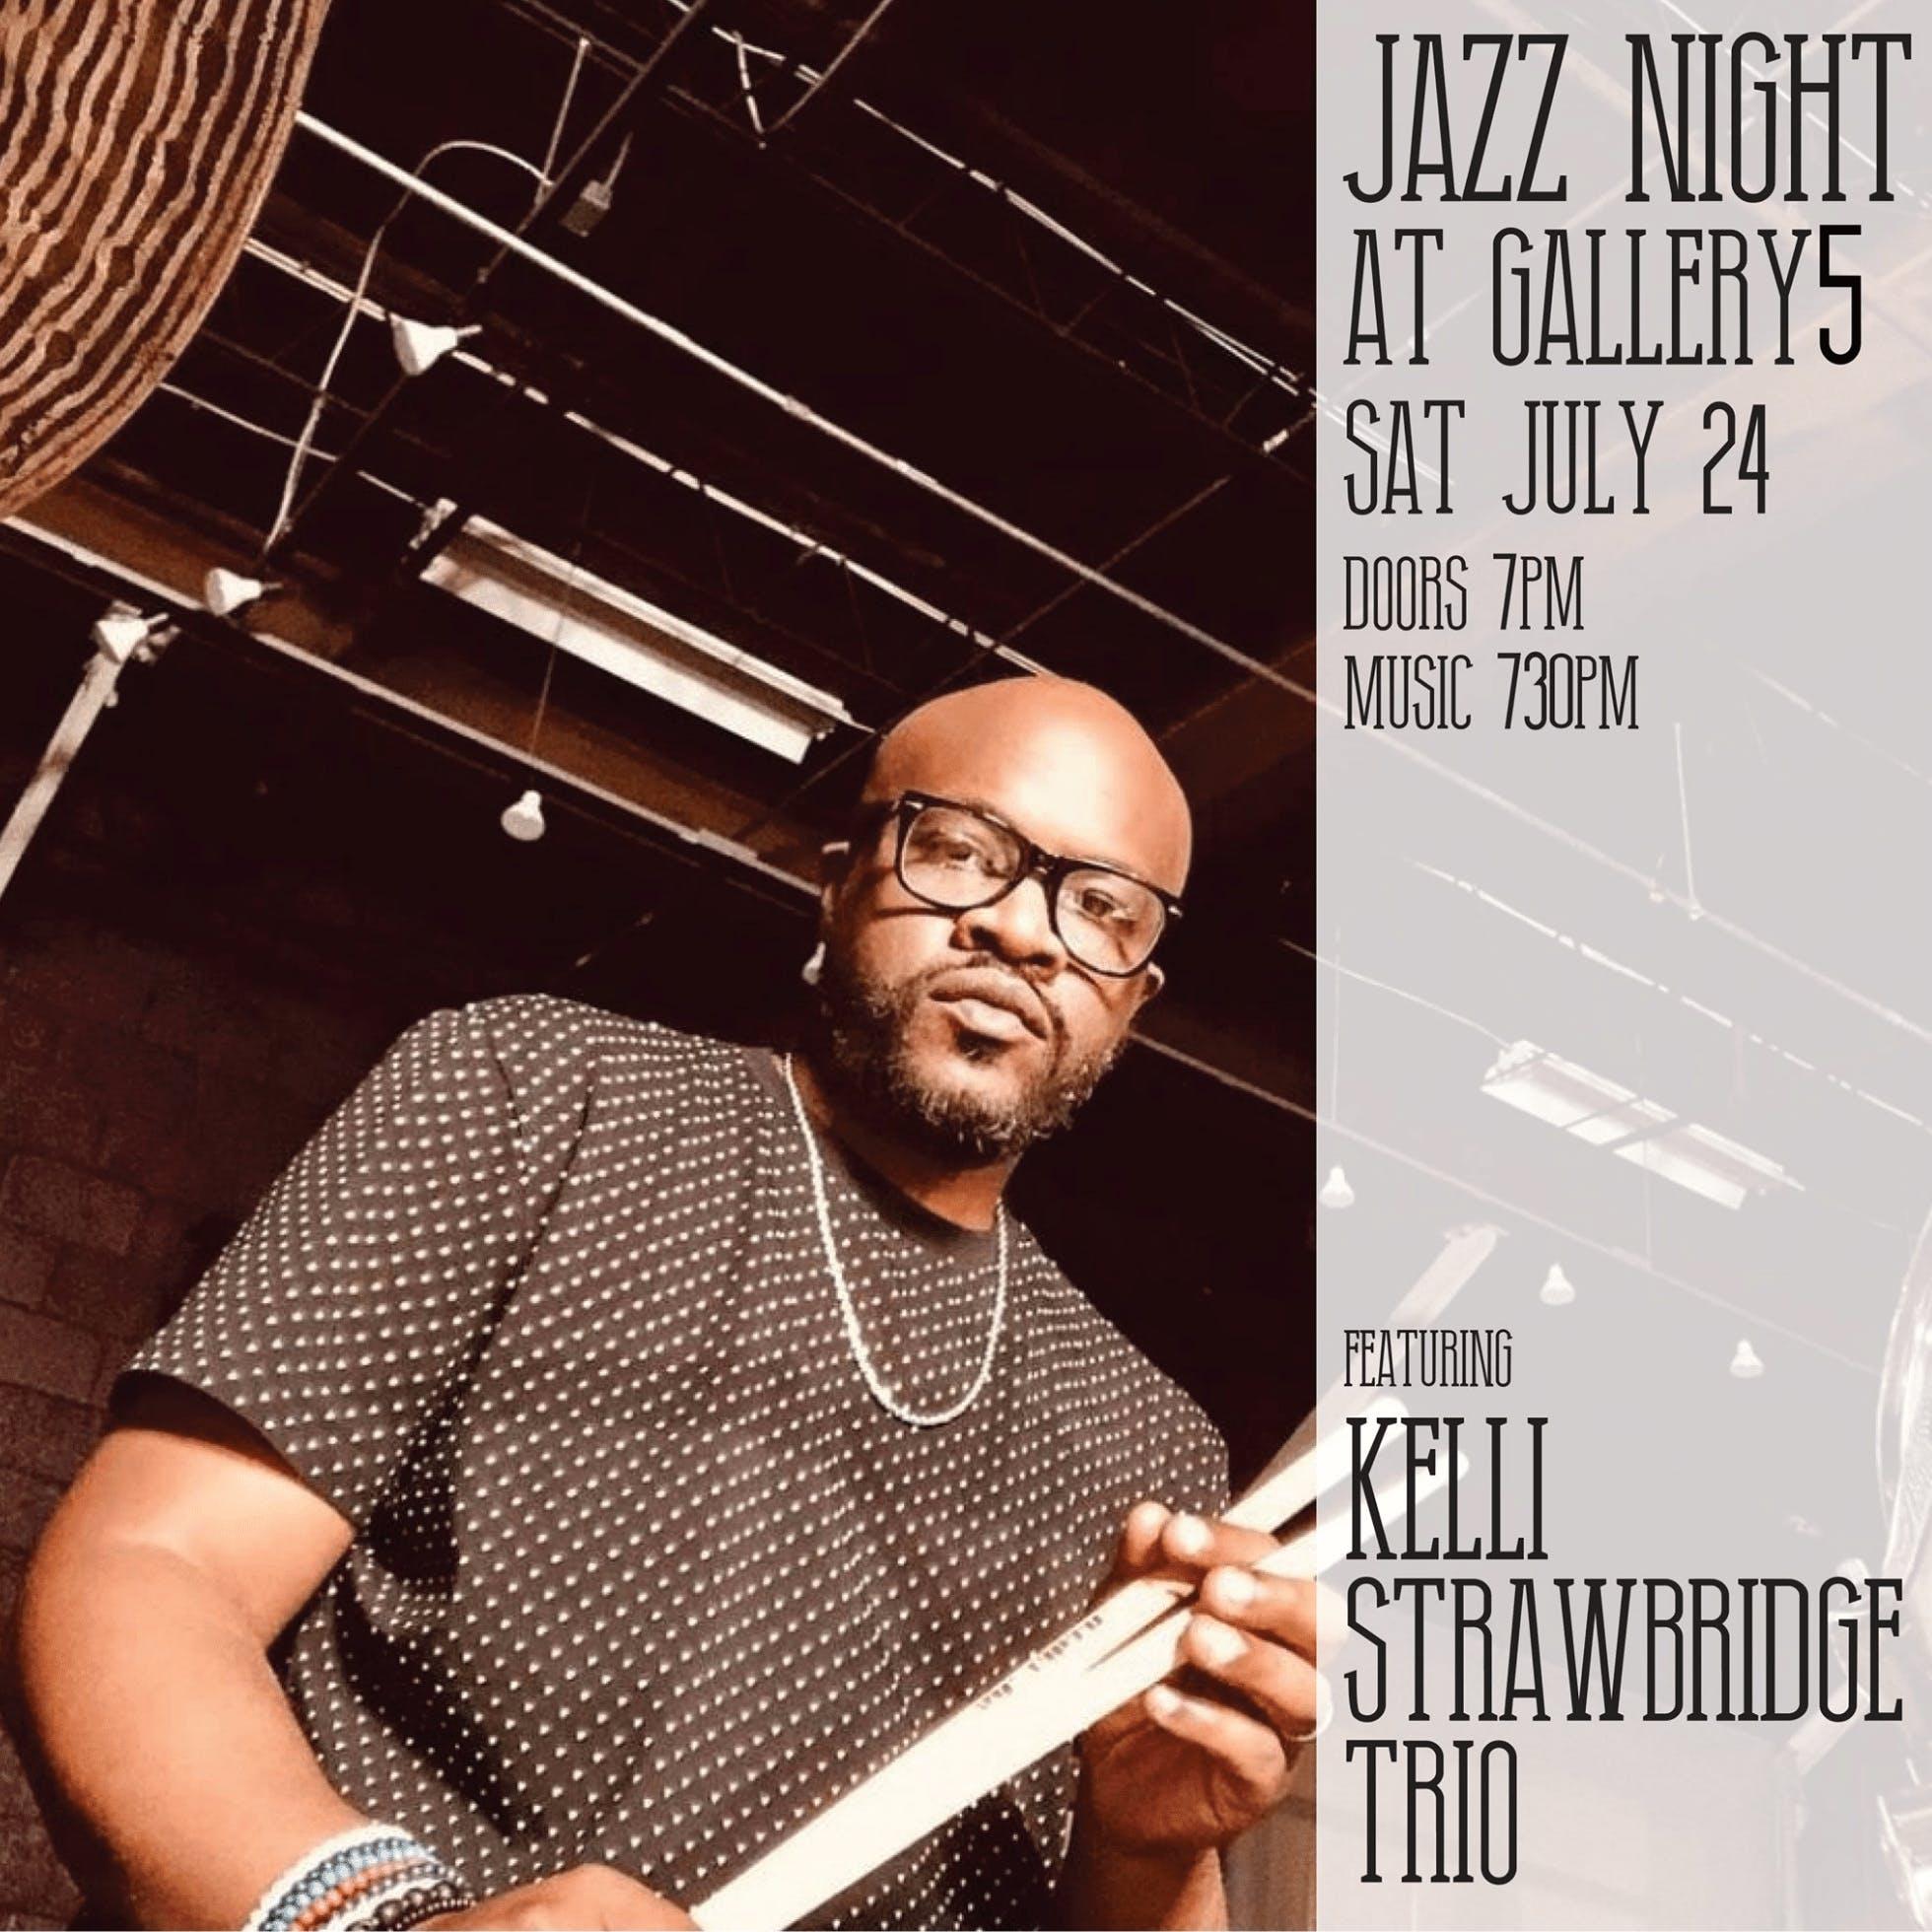 Jazz Night at Gallery5 Featuring Kelli Strawbridge Trio